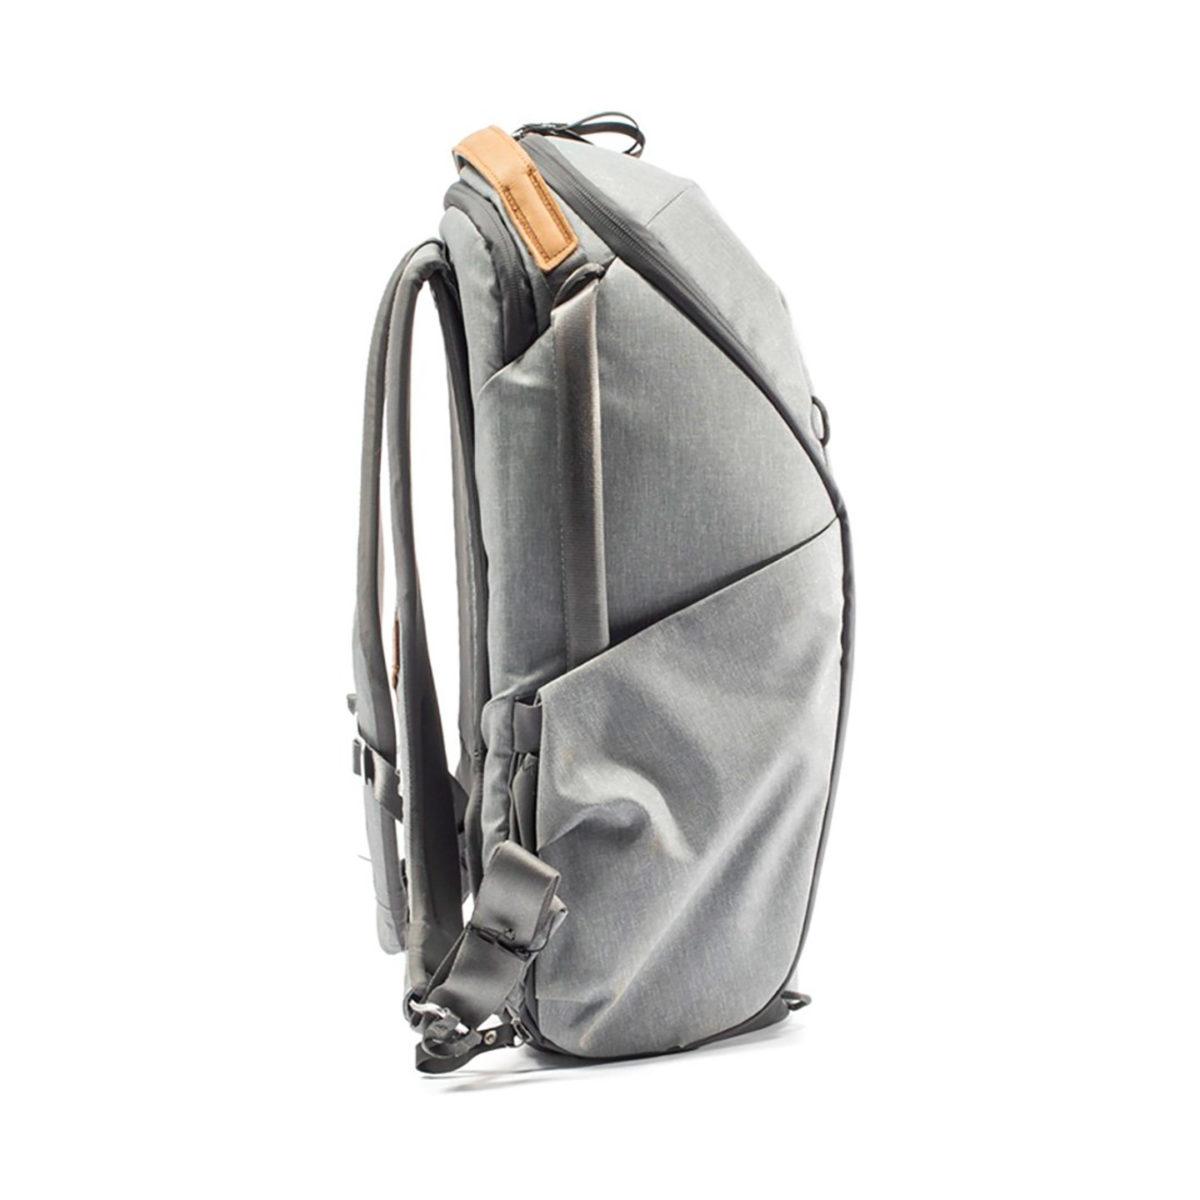 peak_design_everyday_backpack_zip_v2_as_02